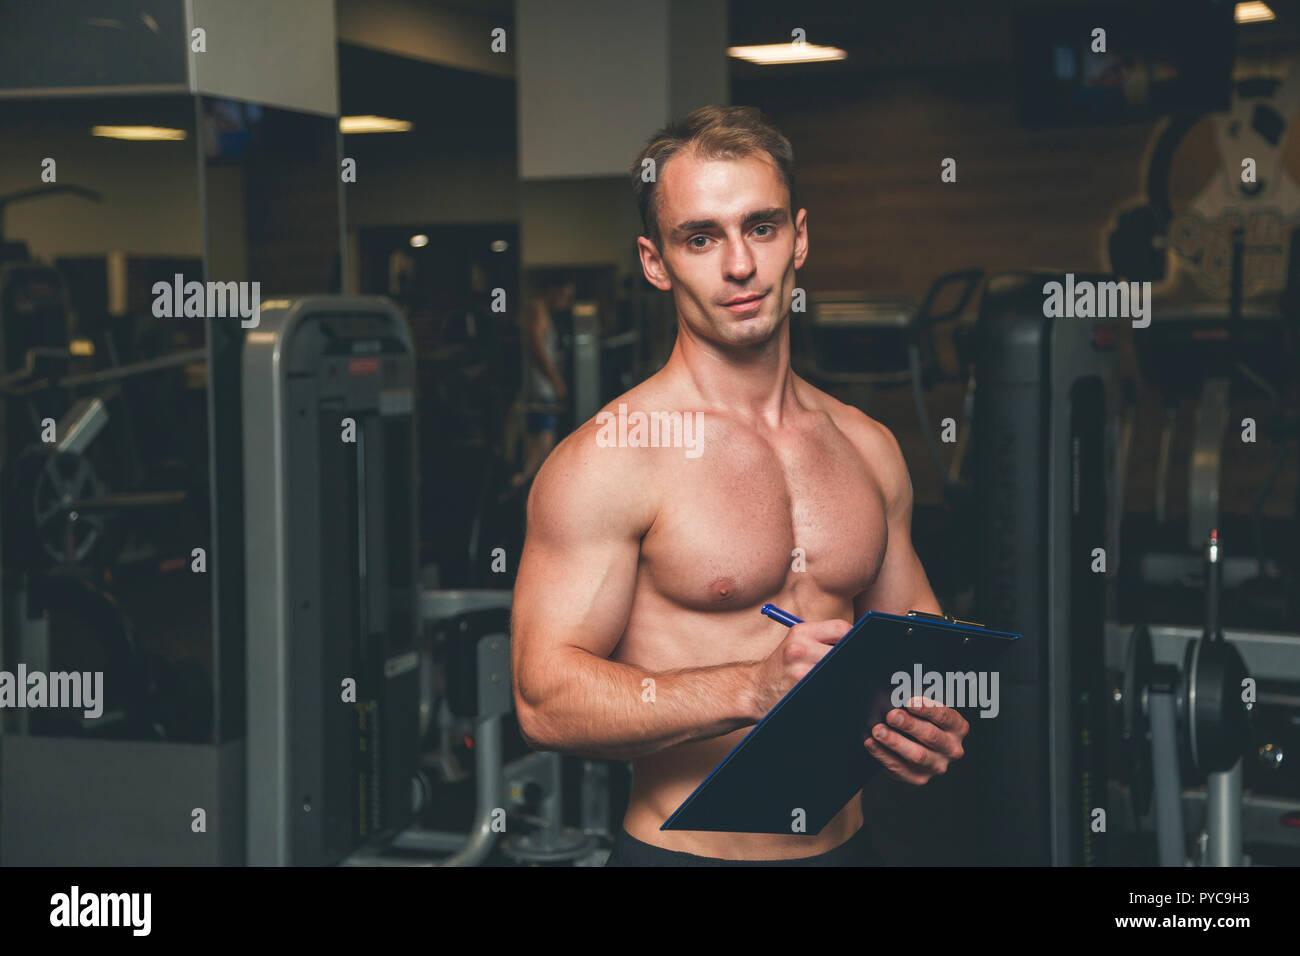 Entrenador de fitness en el gimnasio vertical Imagen De Stock